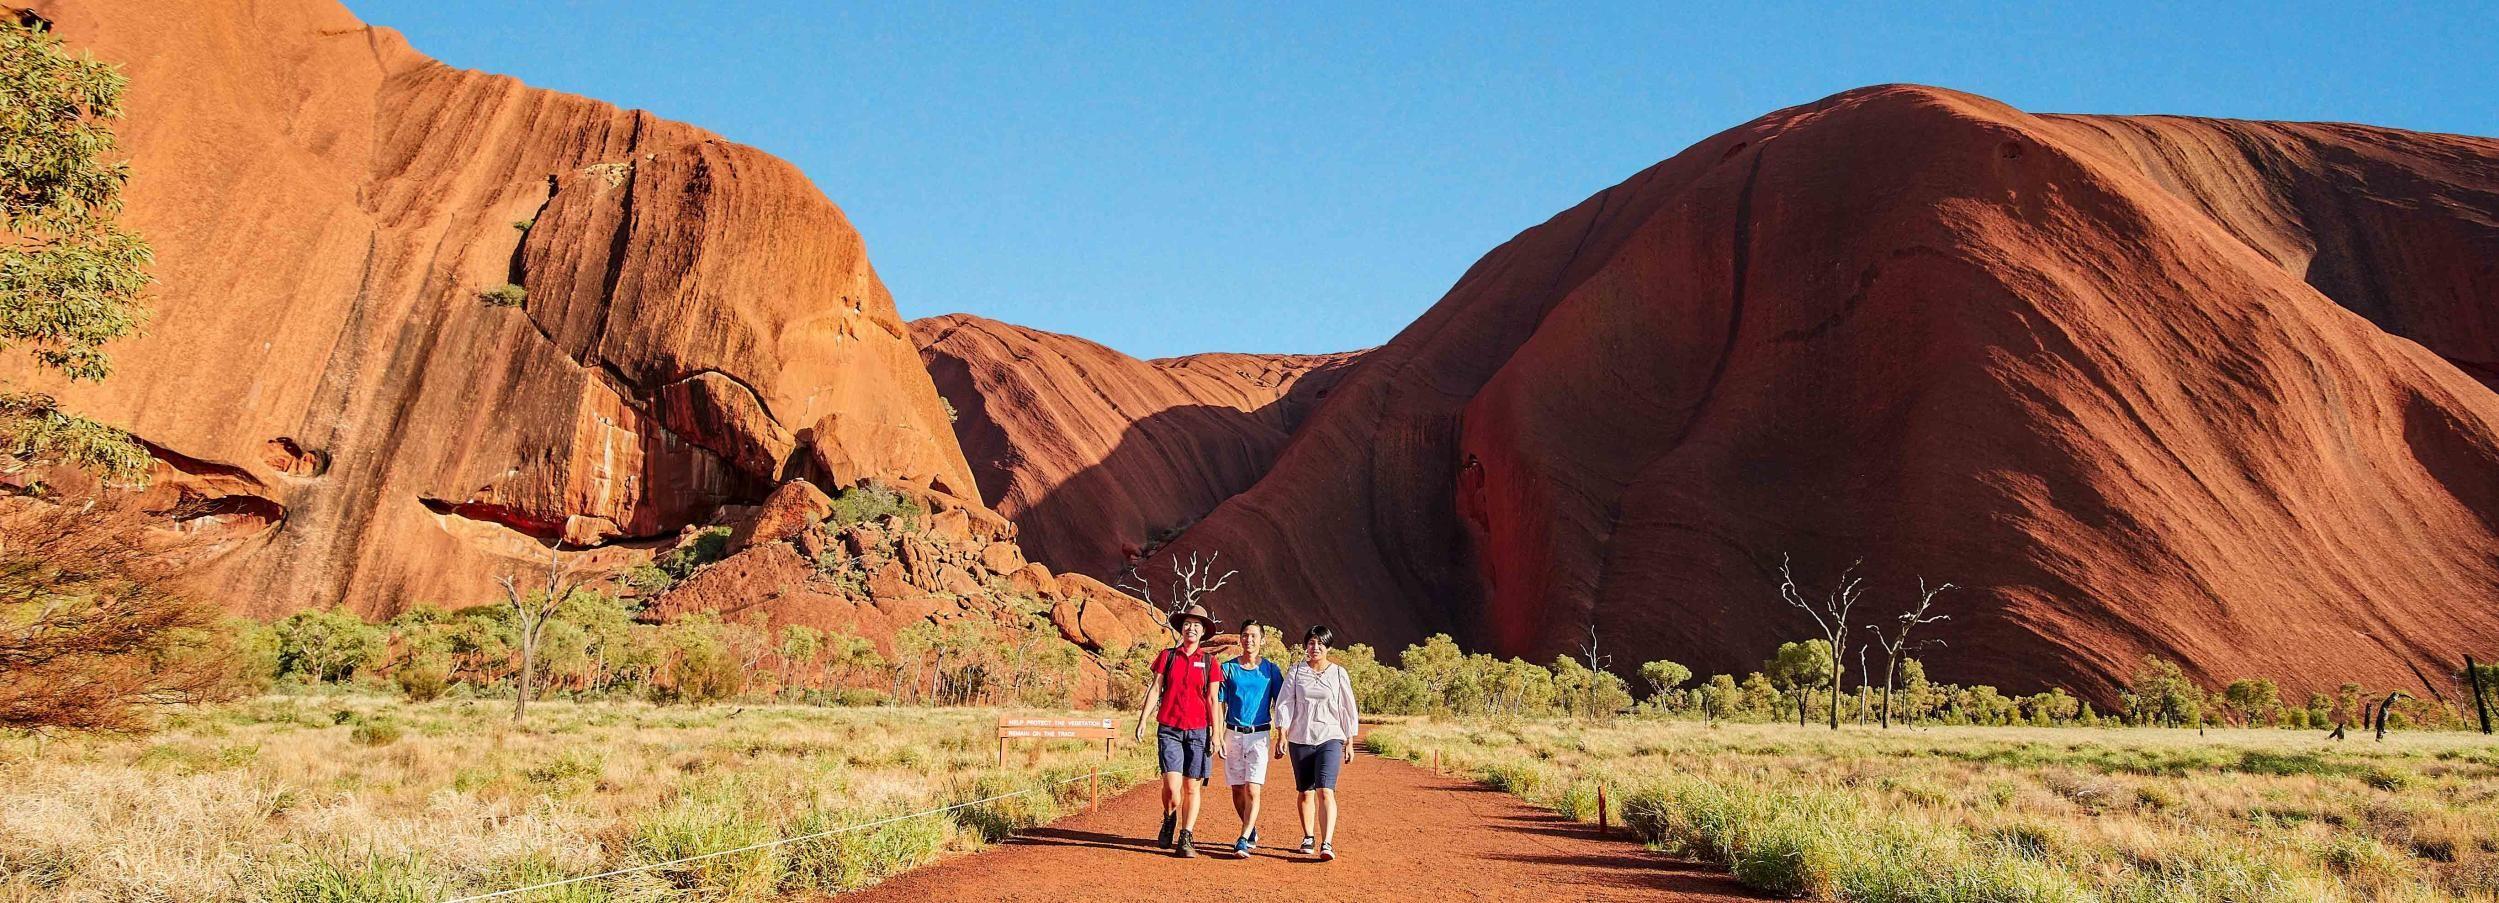 Uluru: Sacred Sites & Sunset Tour with Wine & Cheeseboard